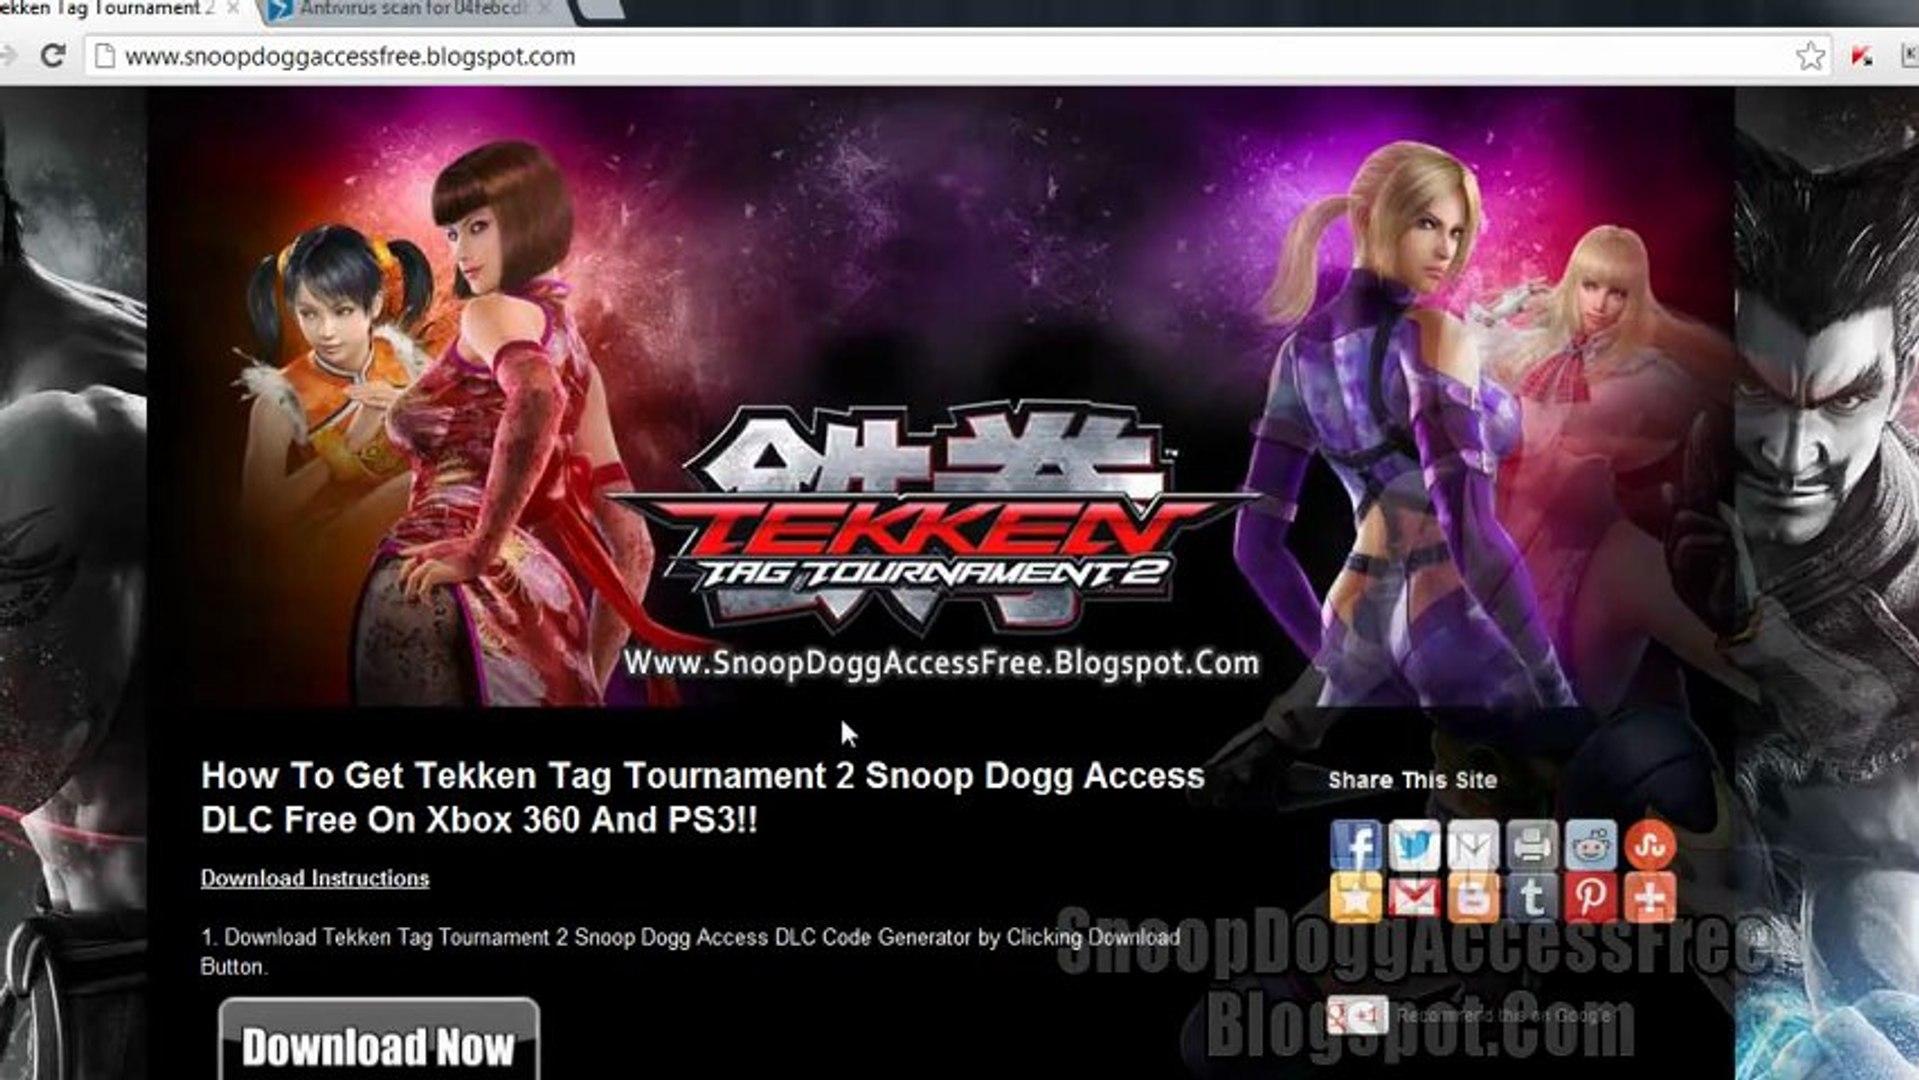 Tekken Tag Tournament 2 Snoop Dogg Access Dlc Xbox 360 Ps3